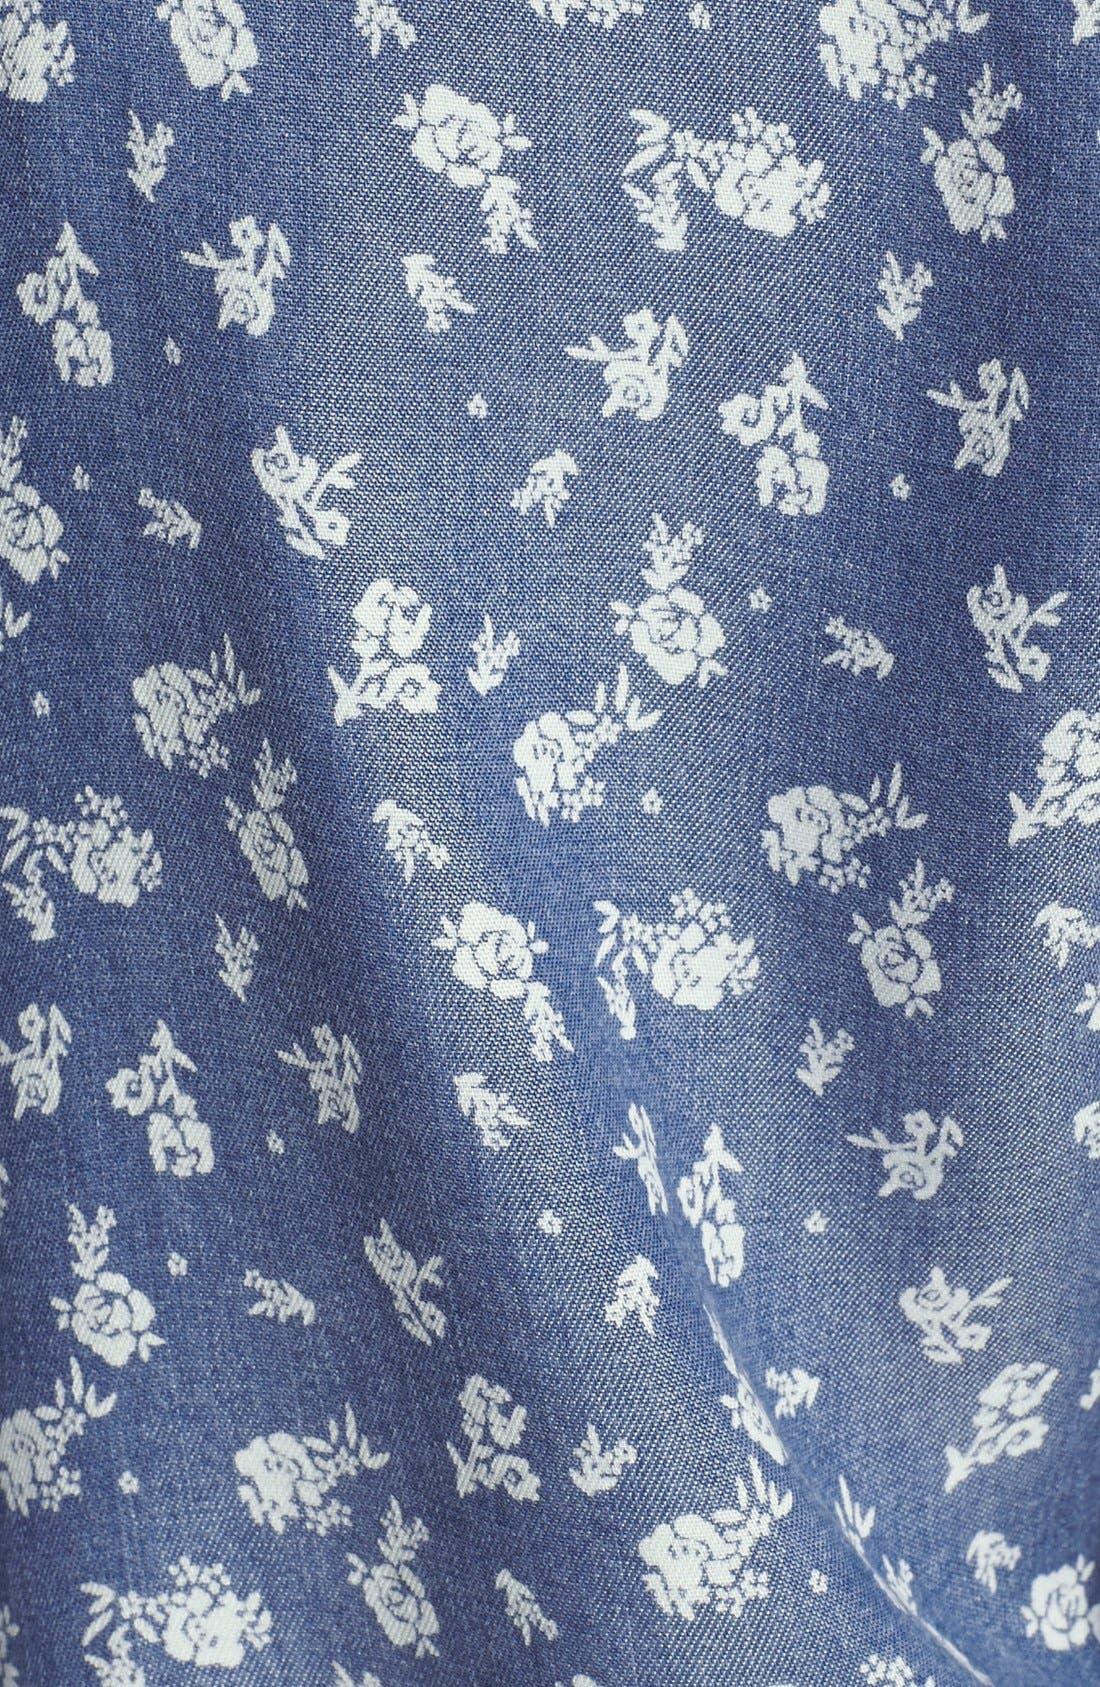 Floral Print Chambray Shirtdress,                             Alternate thumbnail 3, color,                             439